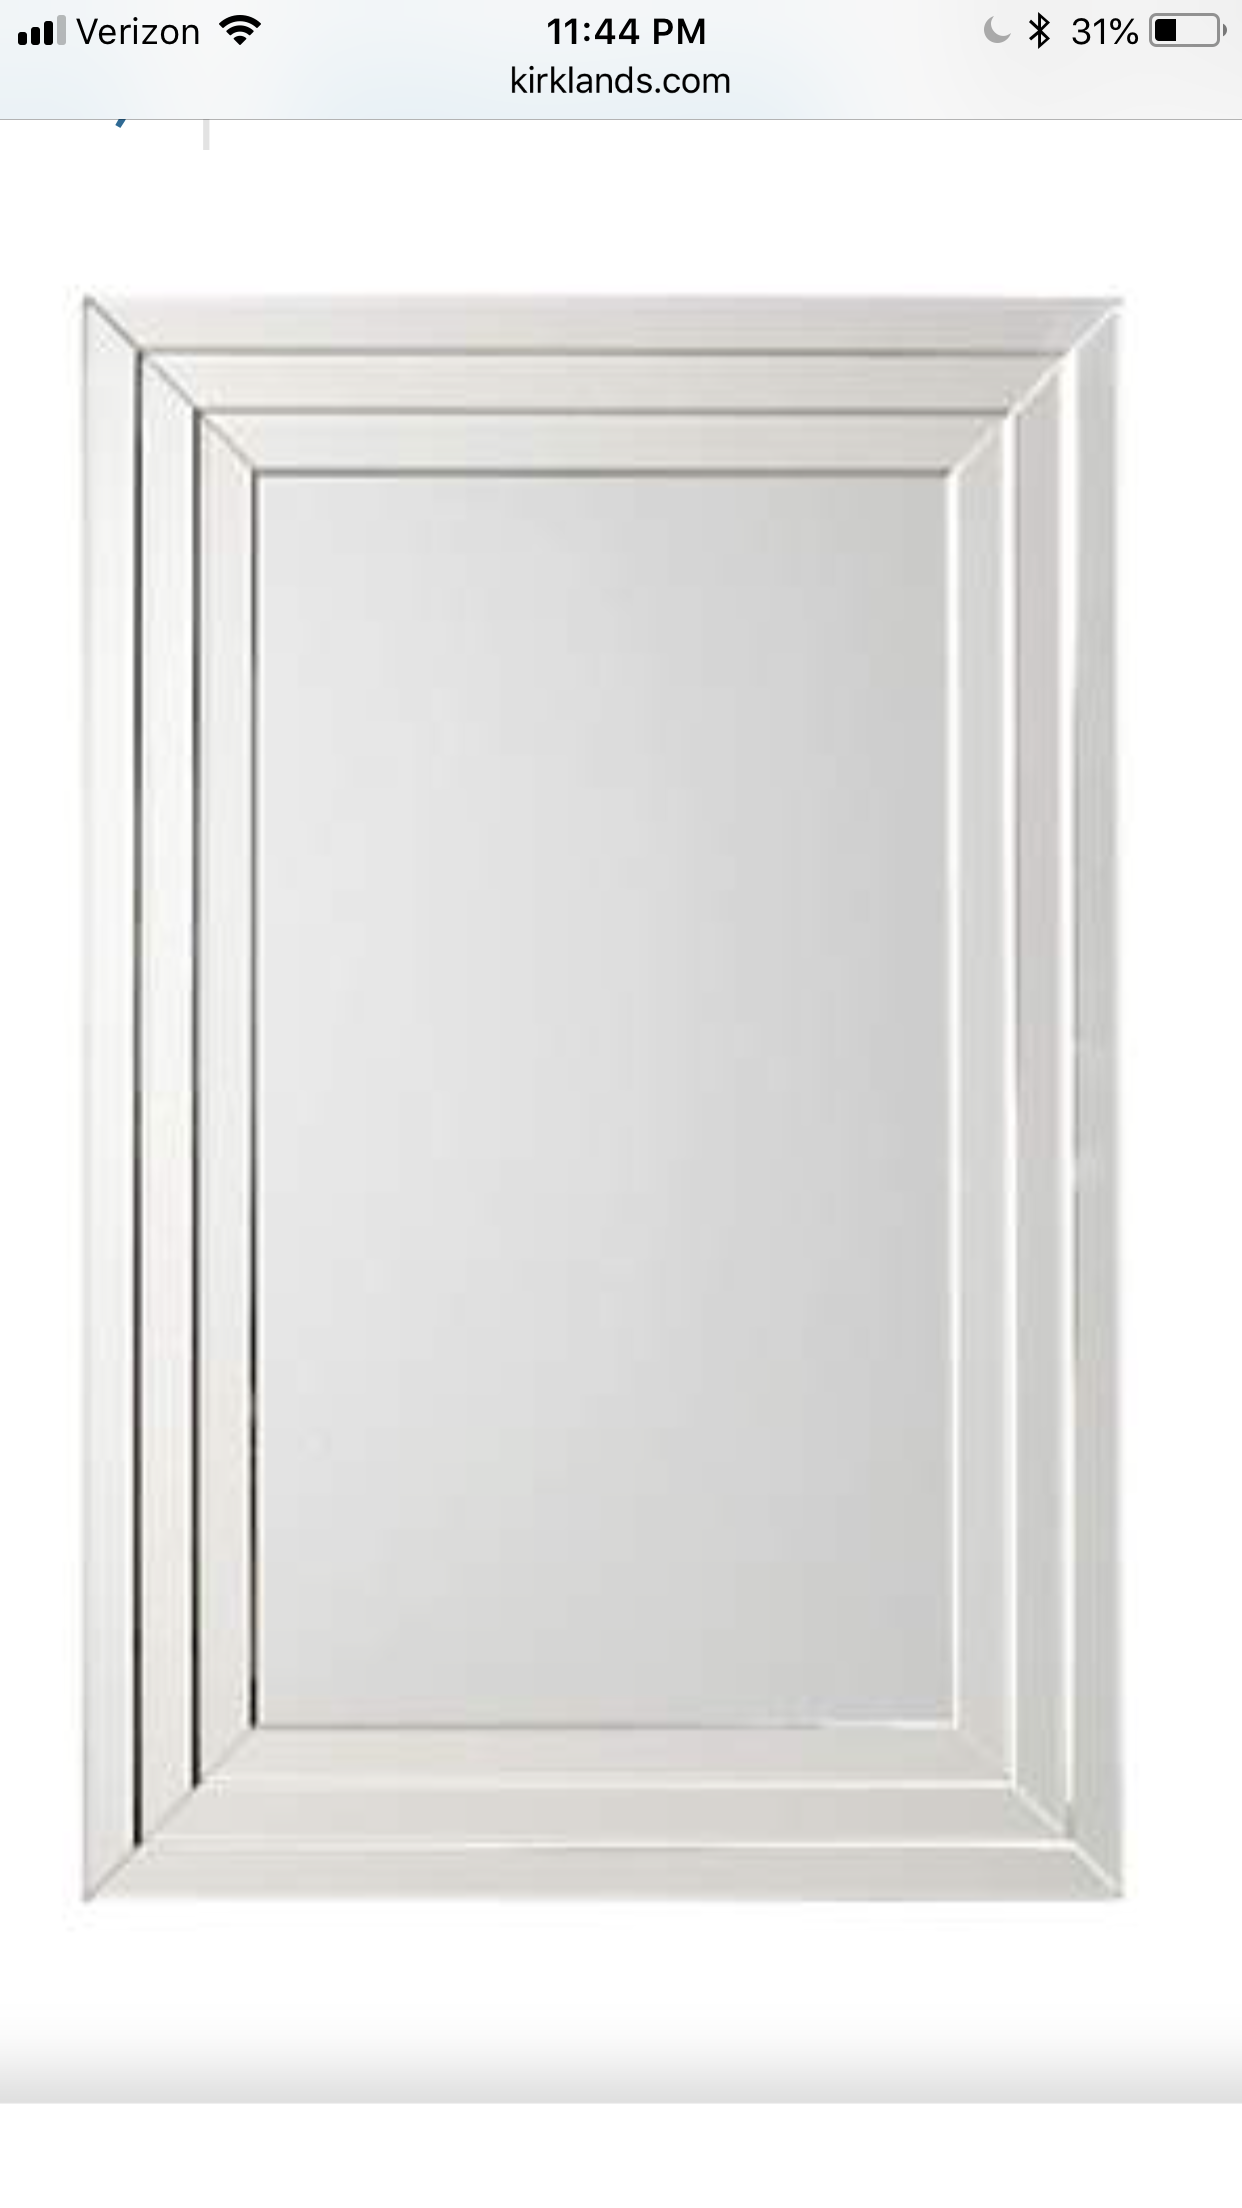 Infinity Frameless Wall Mirror 24x36 In Mirror Wall Mirror